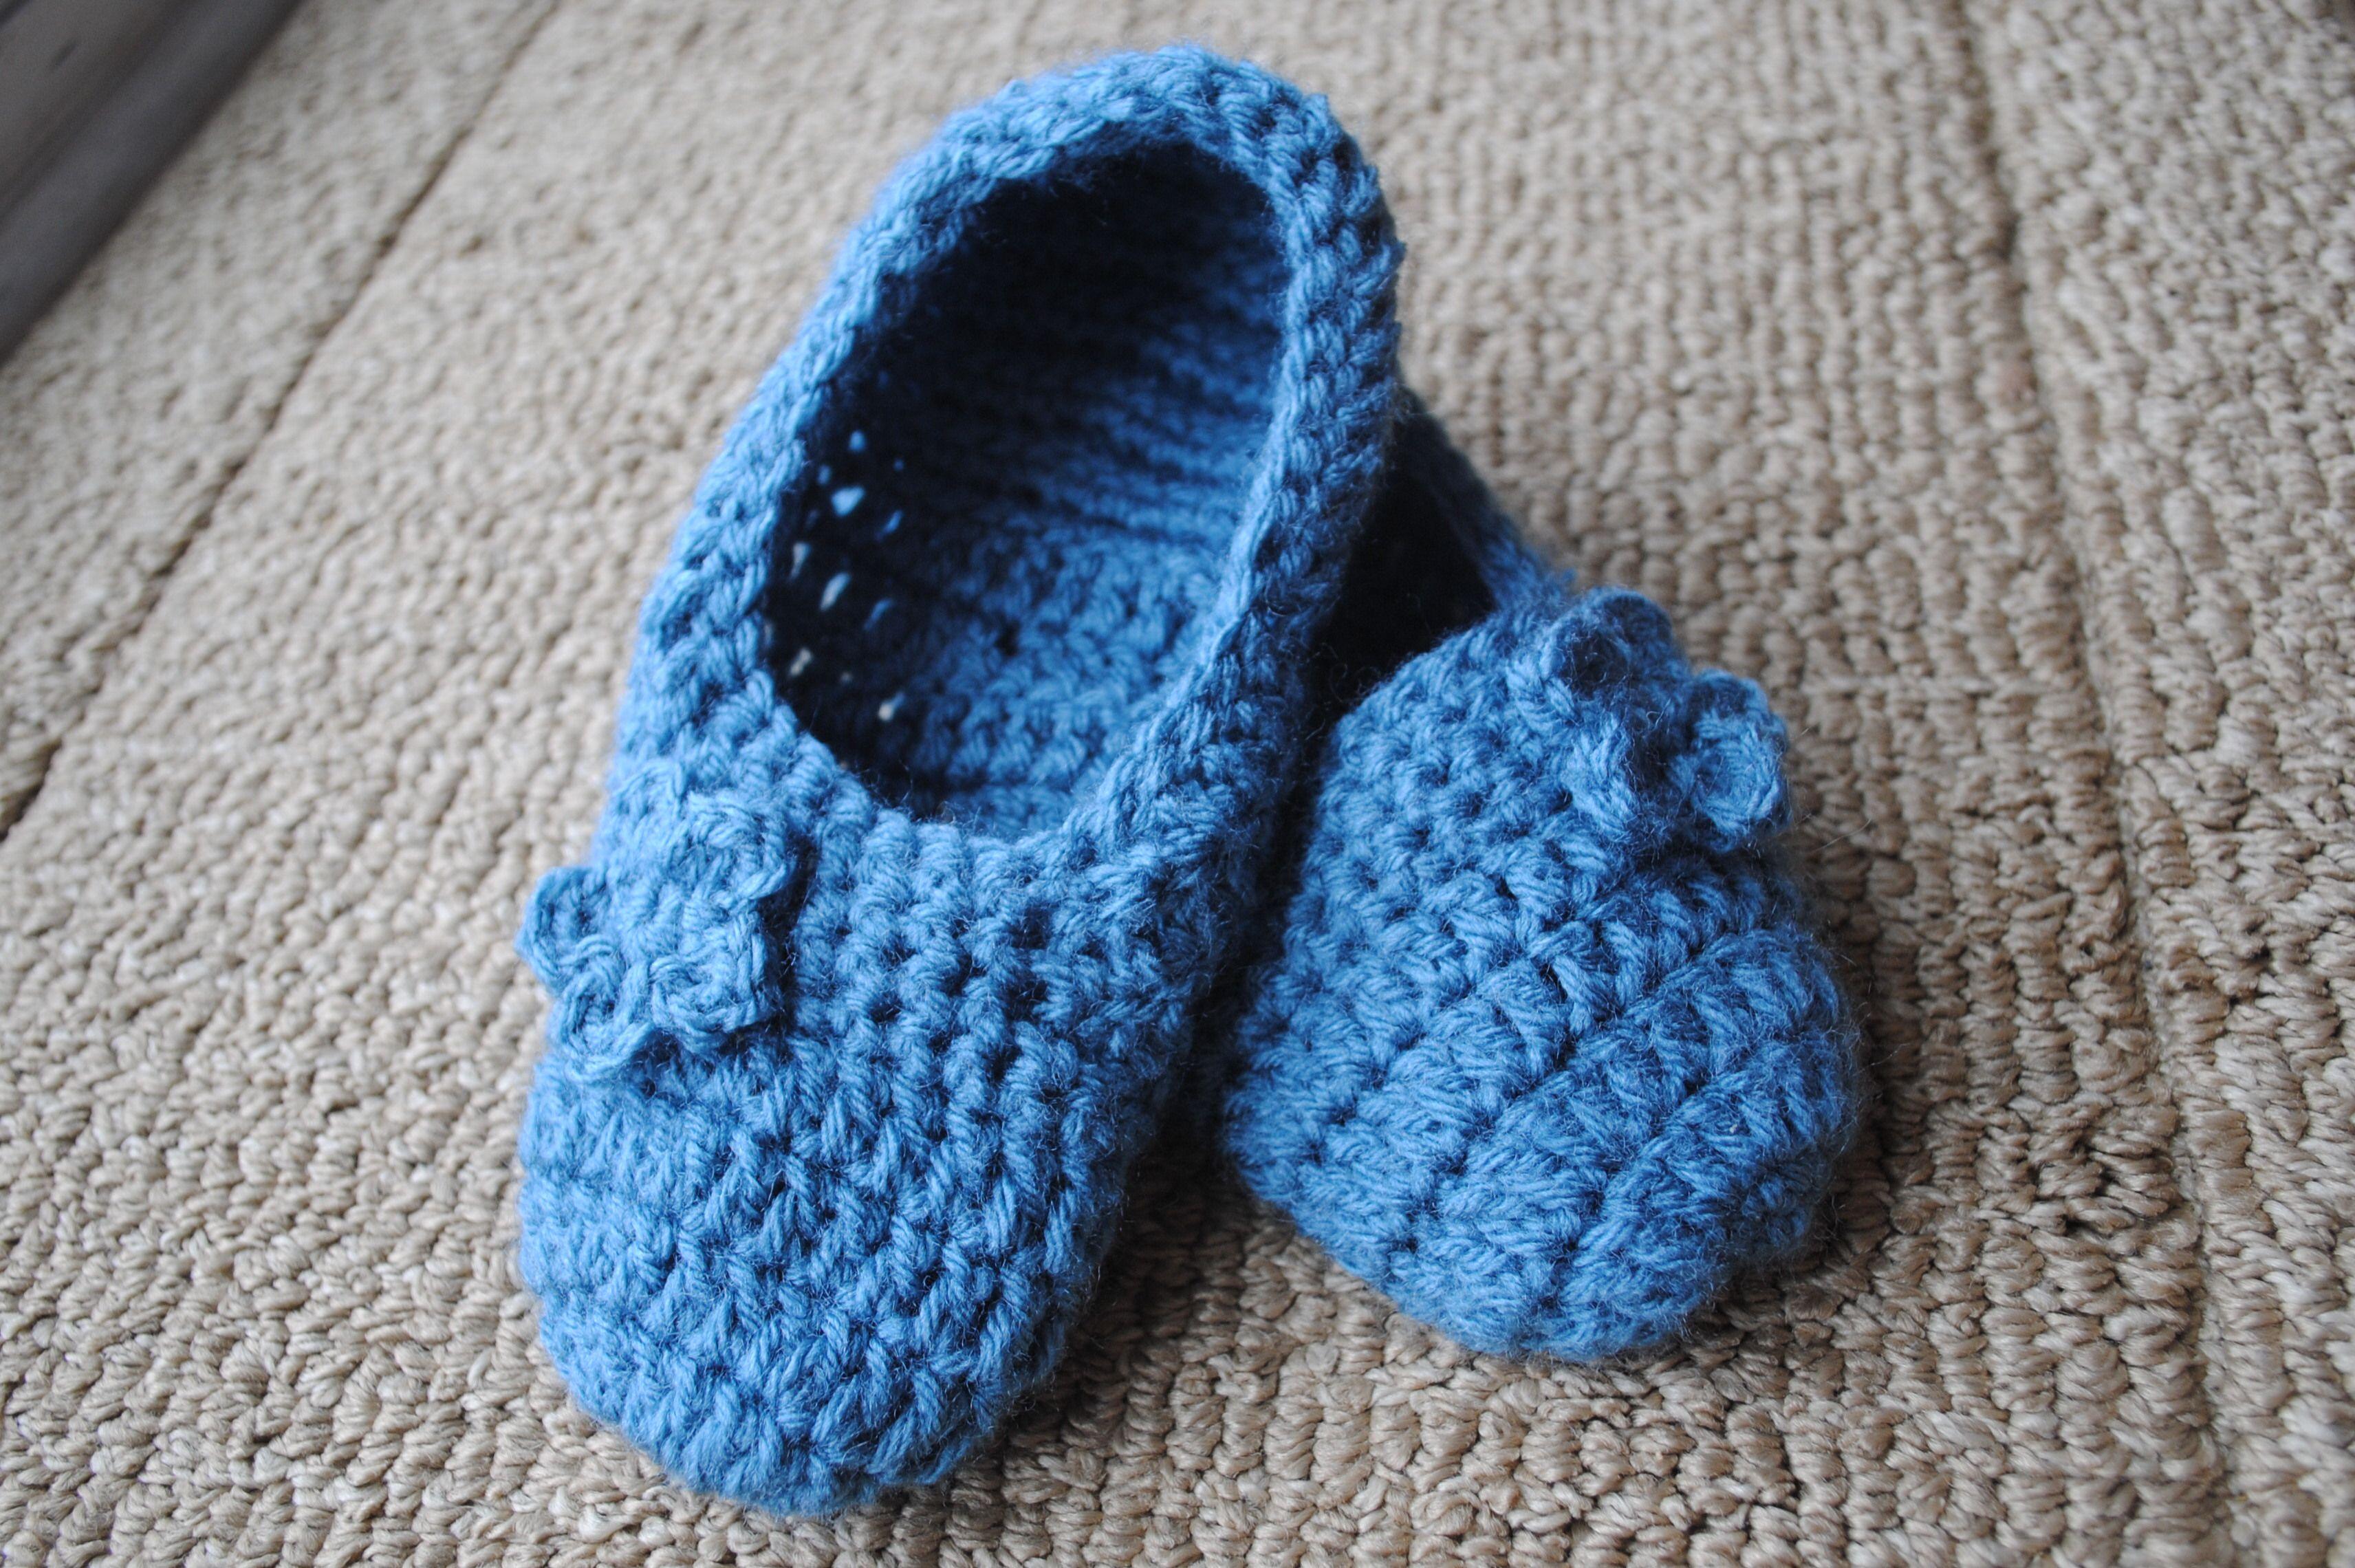 Crochet: Patterns, Articles, eBooks, Magazines, Videos | Medias ...